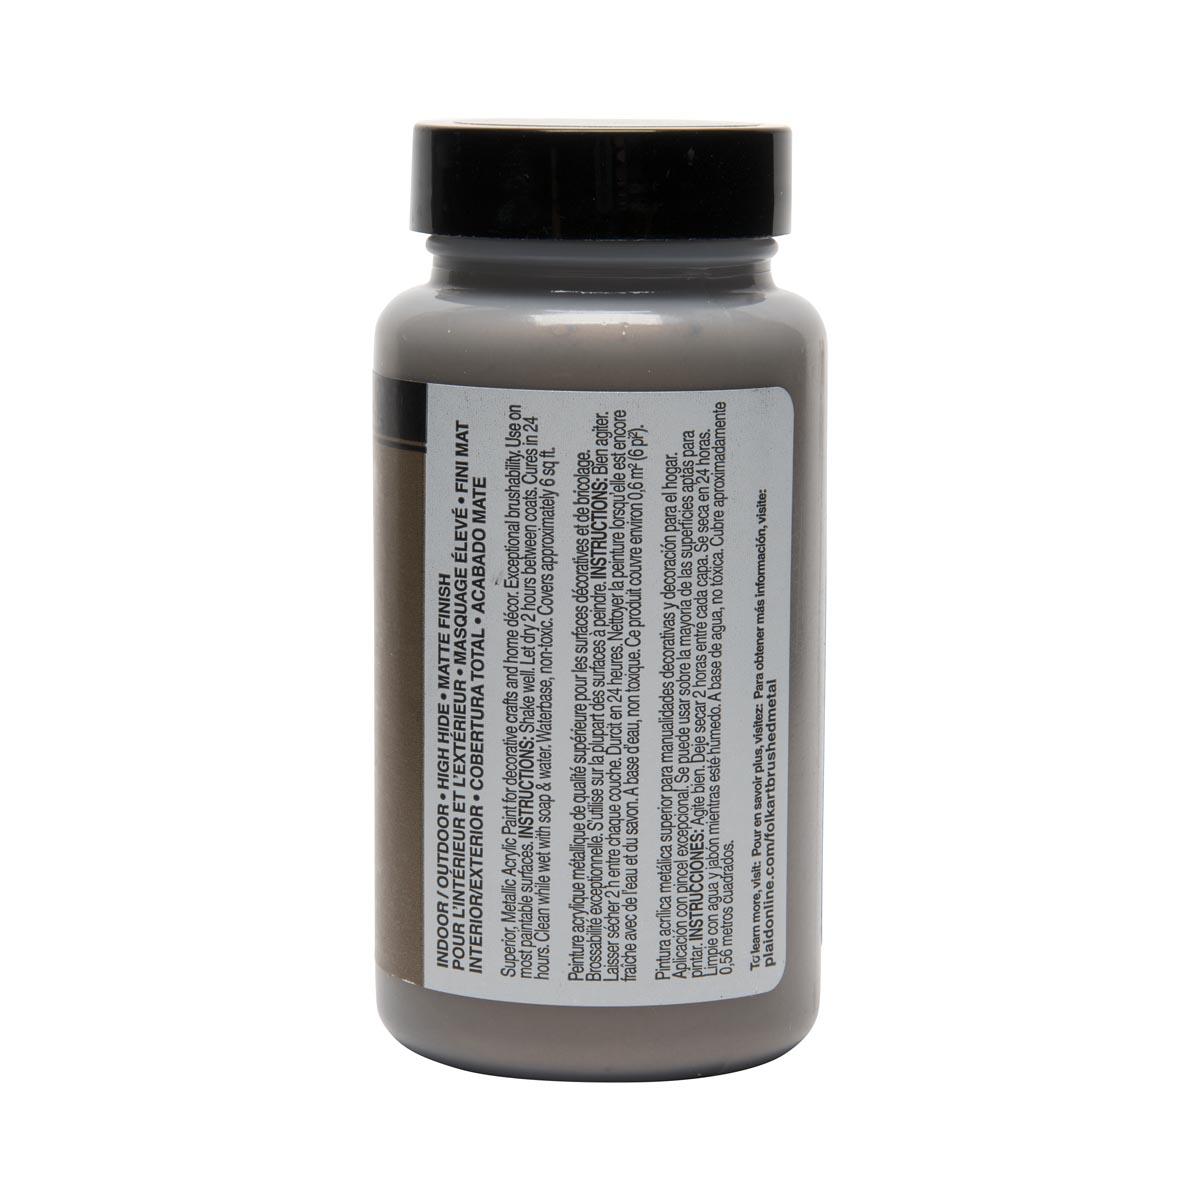 FolkArt ® Brushed Metal™ Acrylic Paint - Bronze, 4 oz.